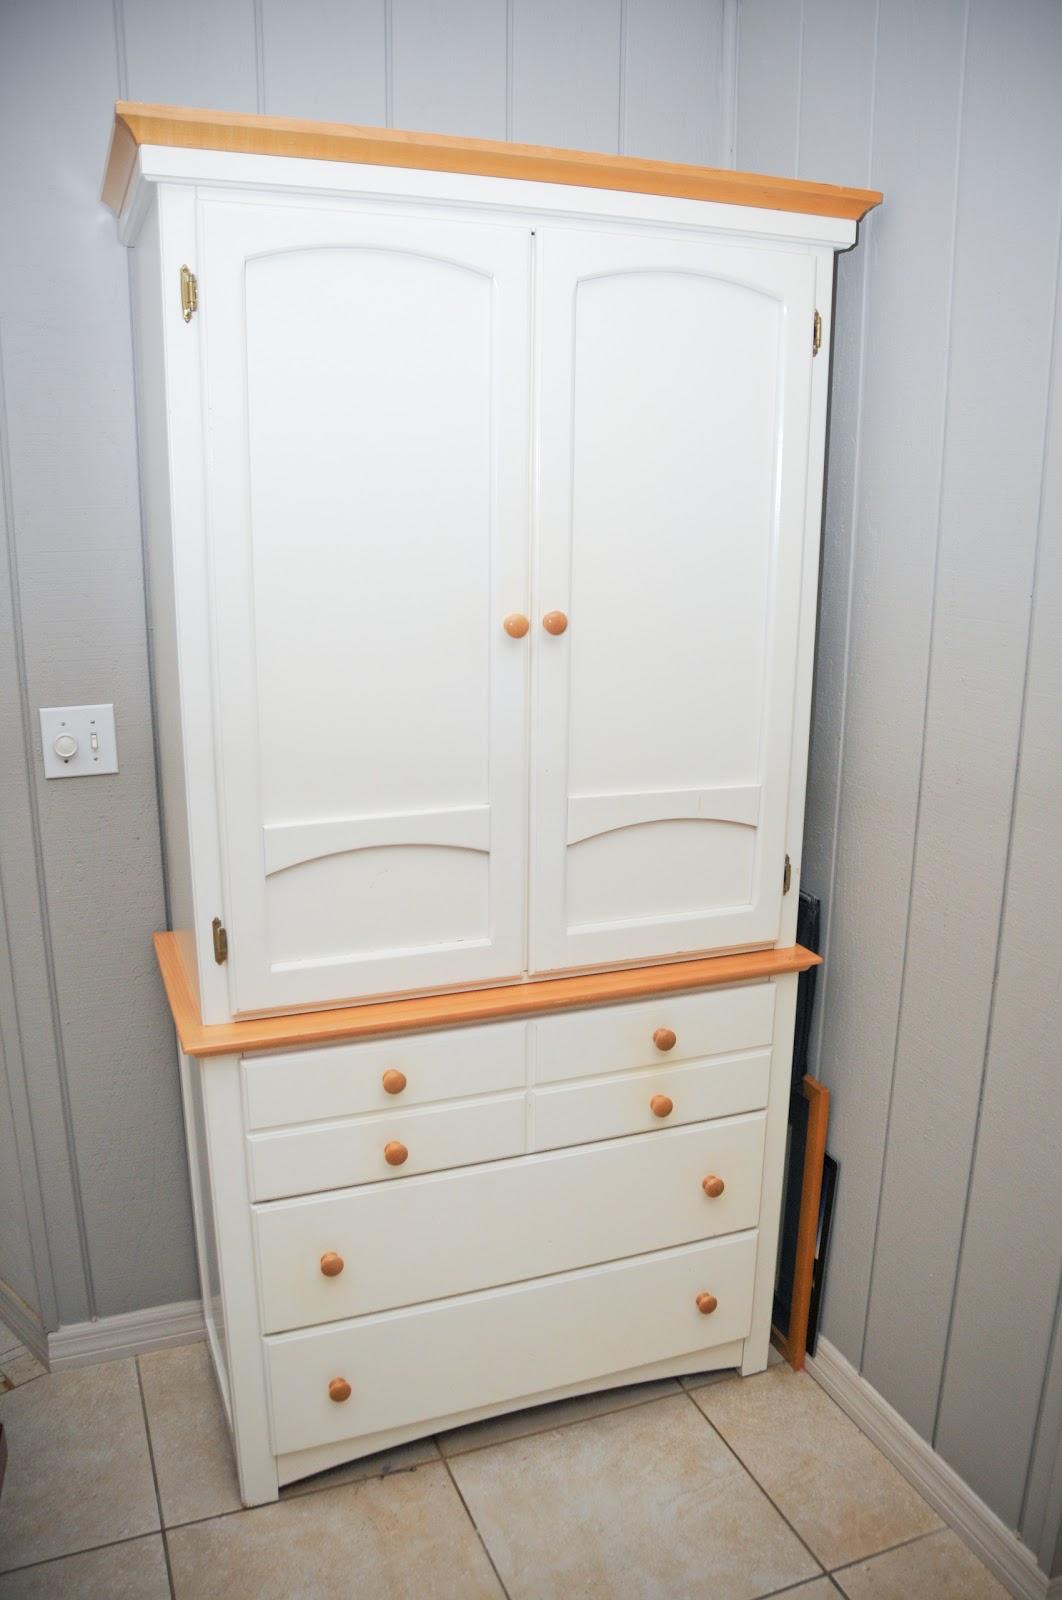 Sarasota craigslist things for sale White wood dresserarmoire combo set